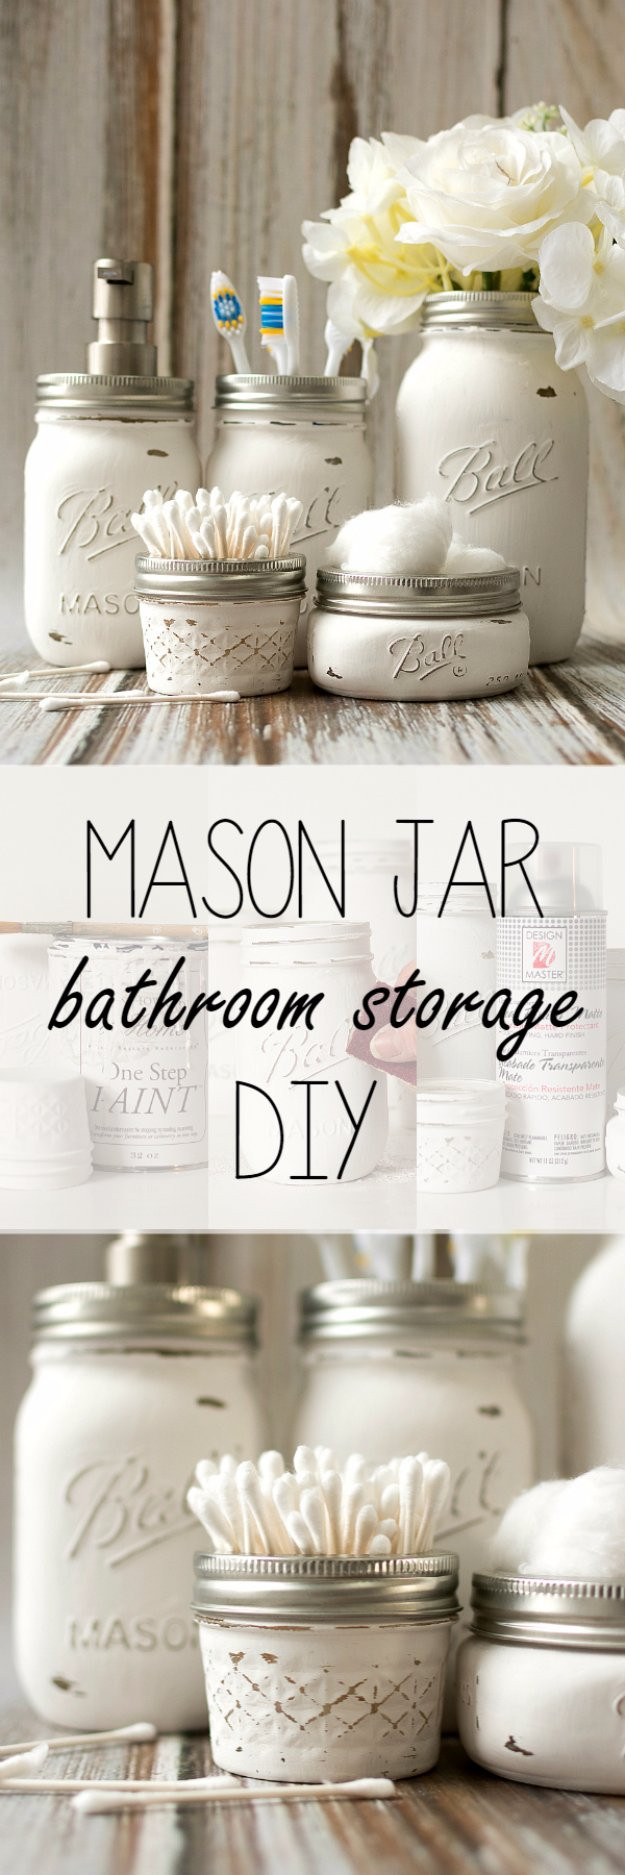 Best ideas about Bathroom Decorating Ideas DIY . Save or Pin 31 Brilliant DIY Decor Ideas for Your Bathroom Now.